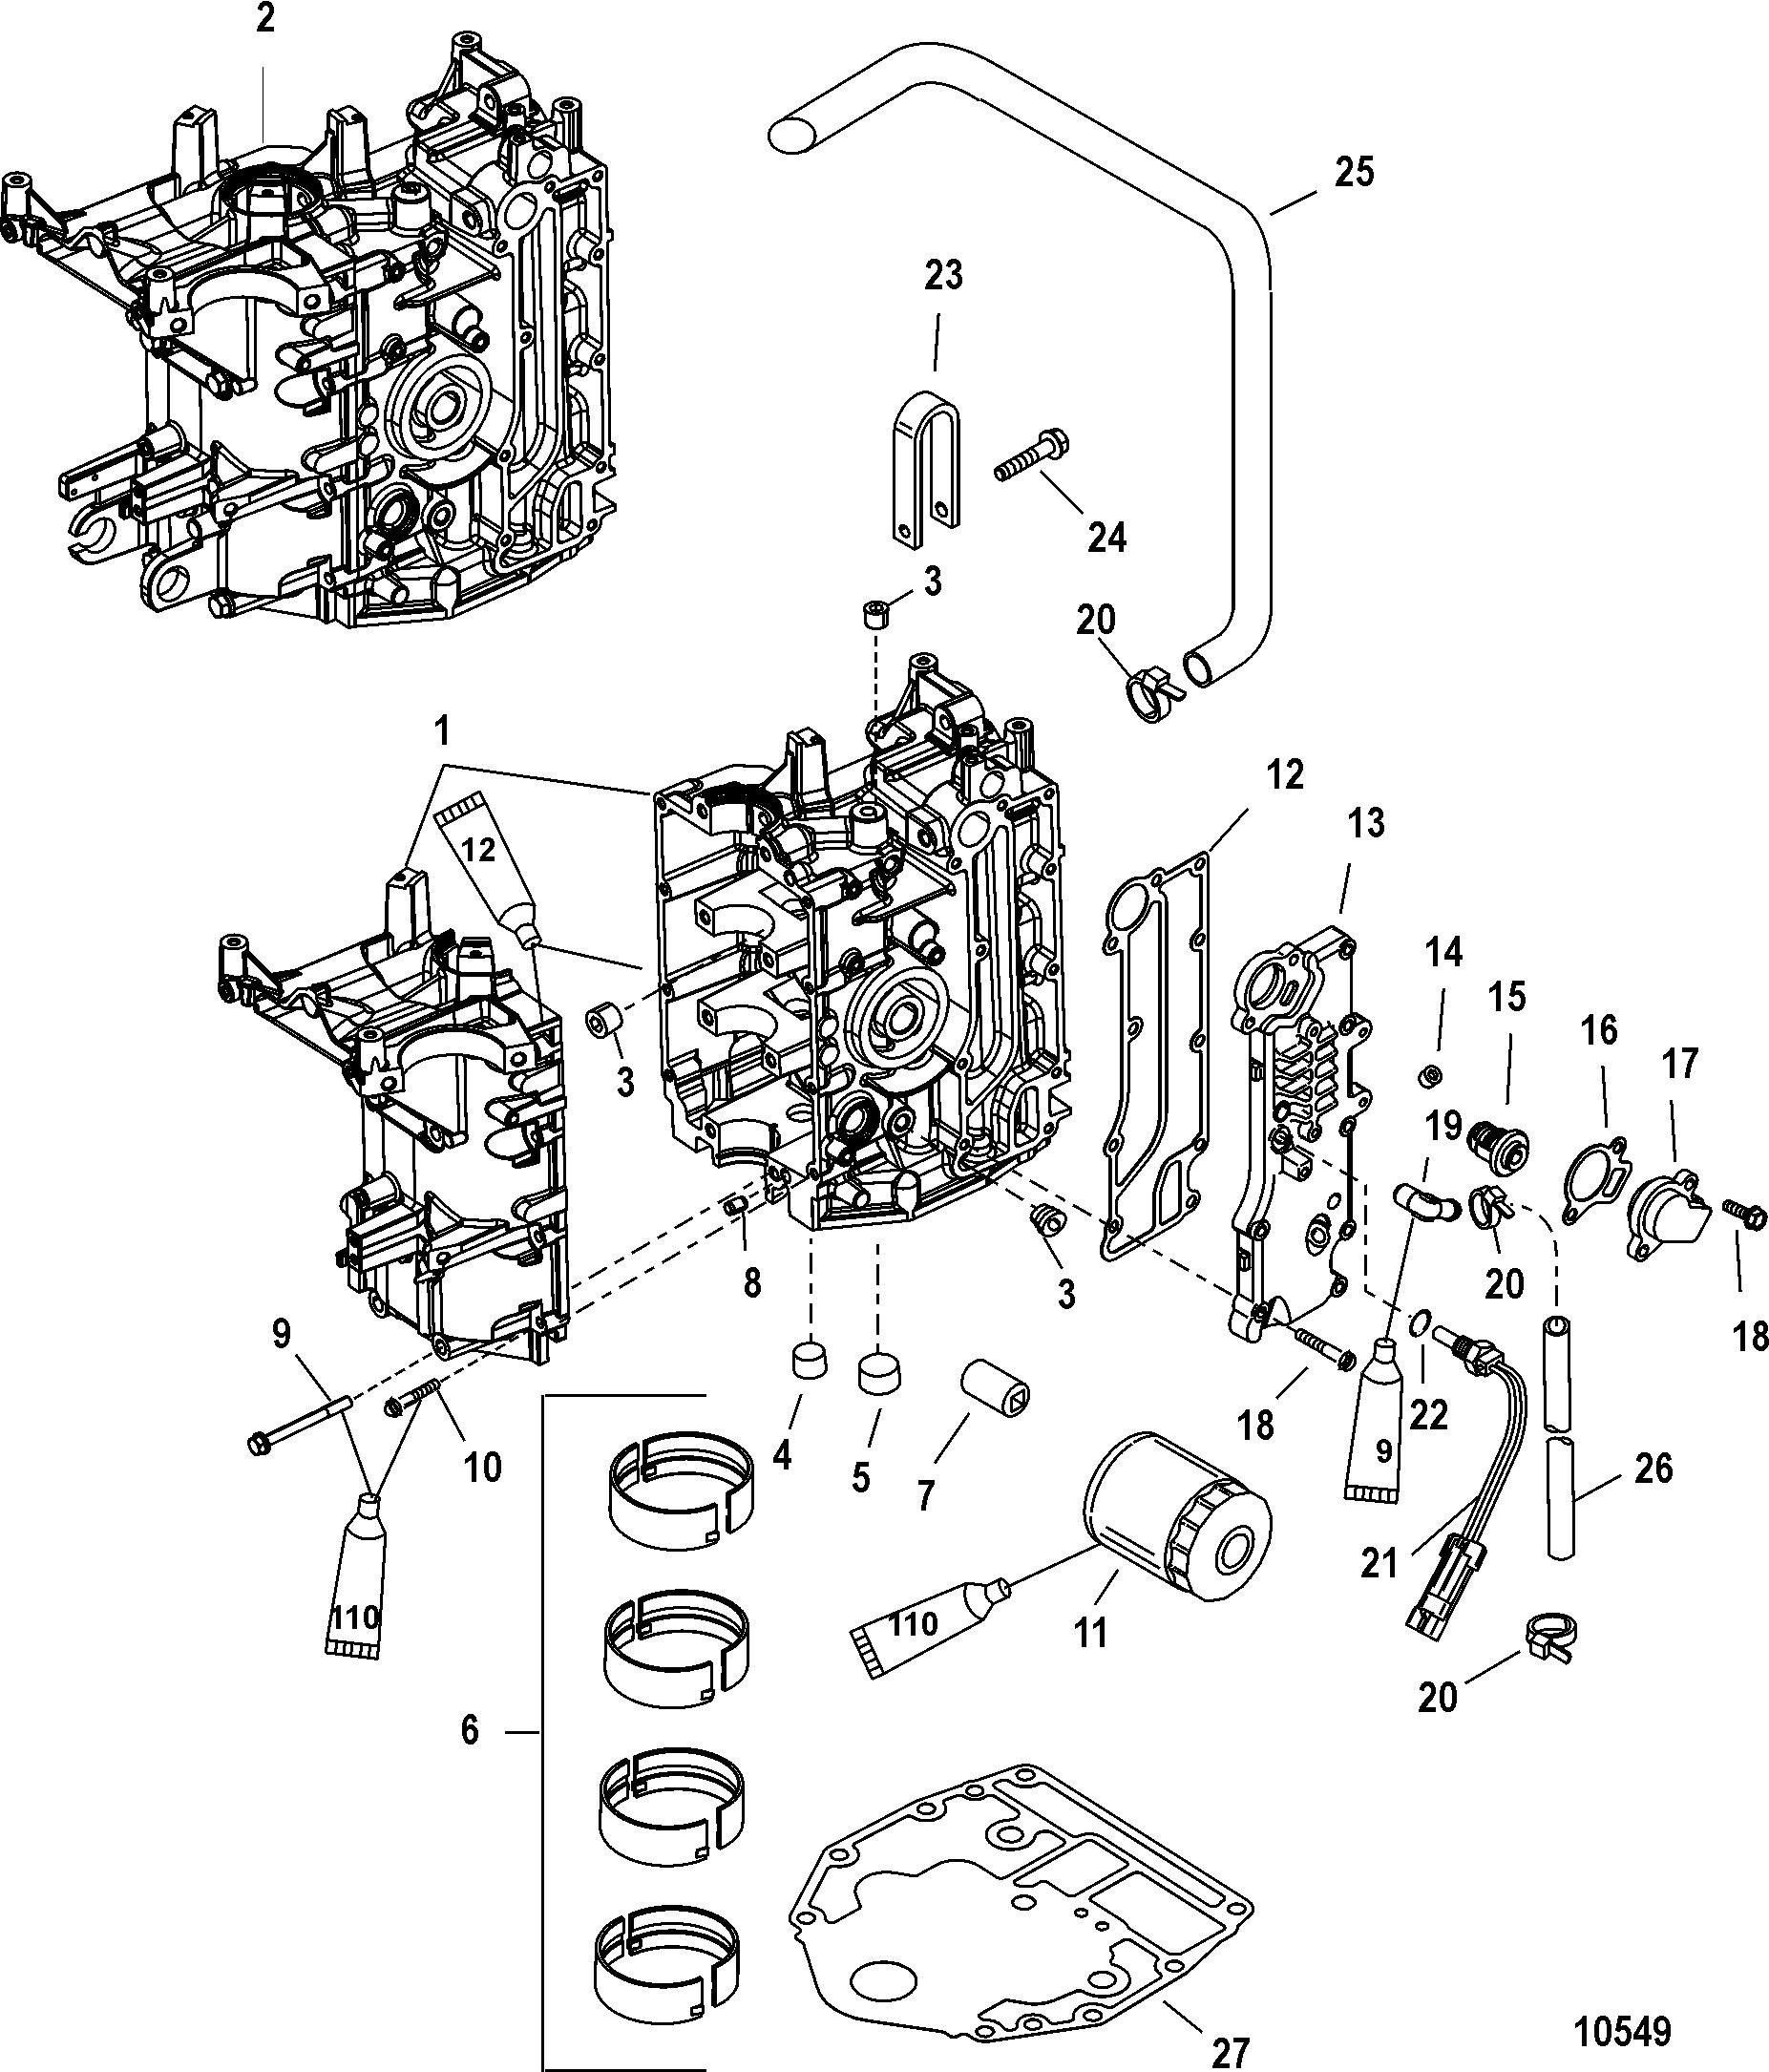 mercury 115 wiring diagram rheem tankless electric water heater outboard hp 6 cylinder diagrams